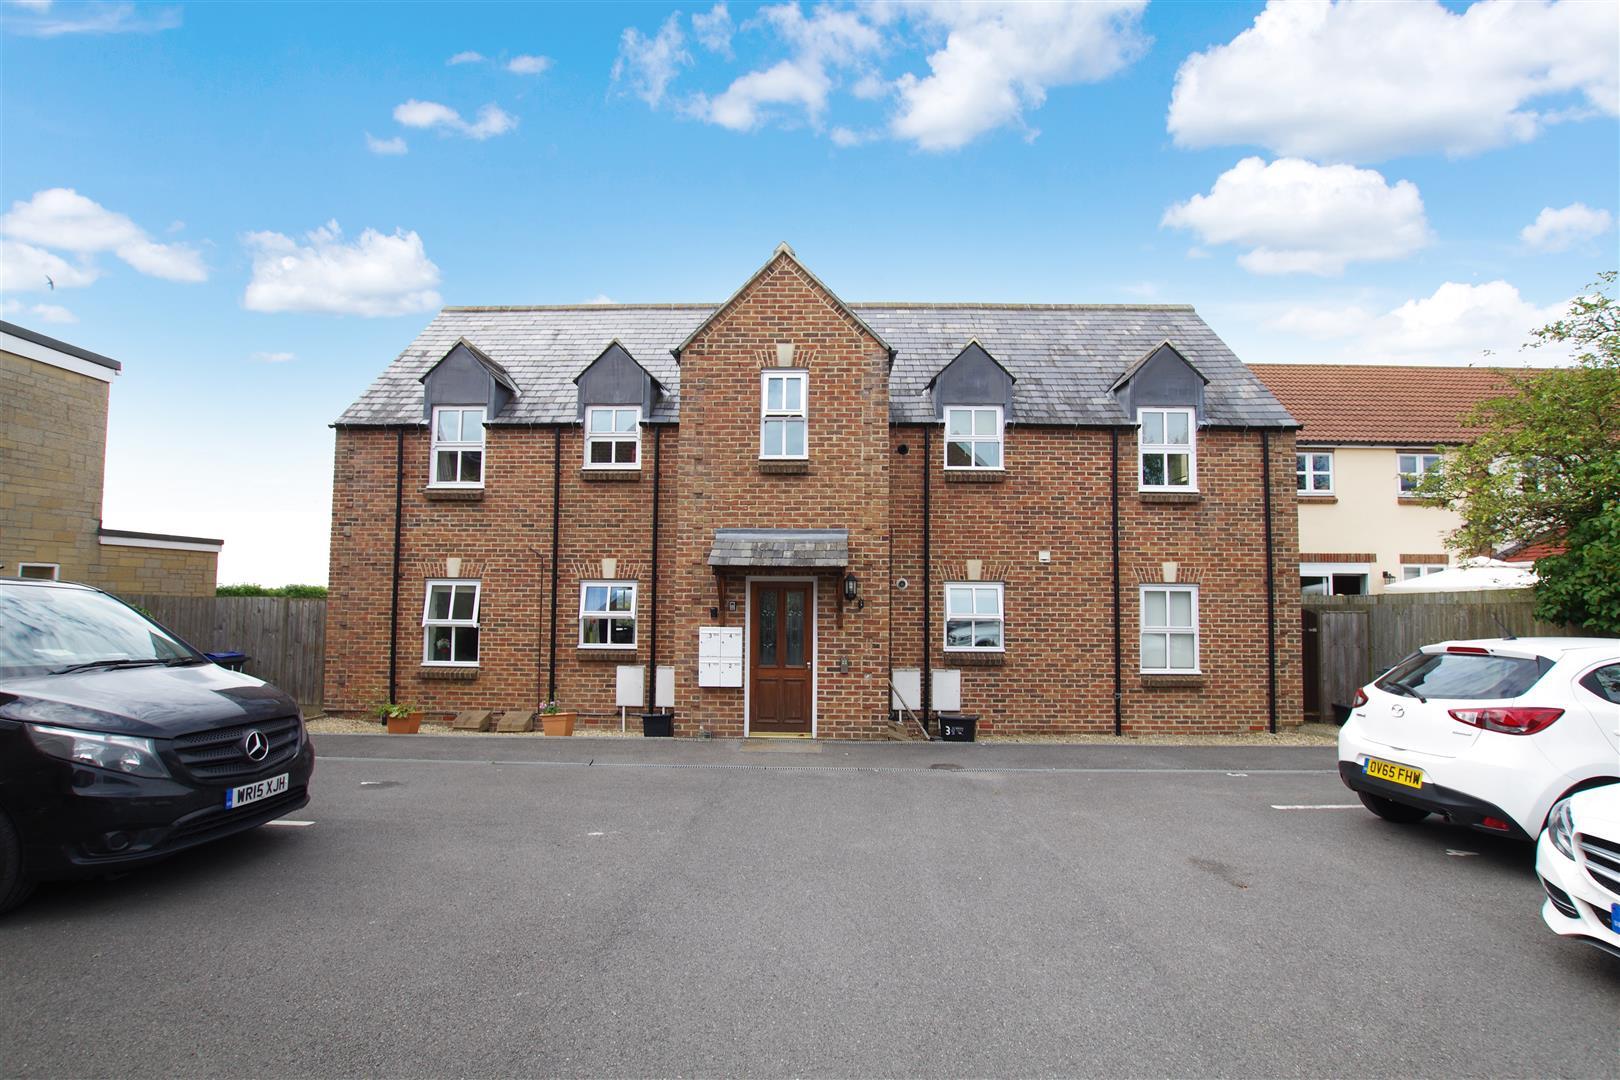 Buthay Court, Royal Wootton Bassett